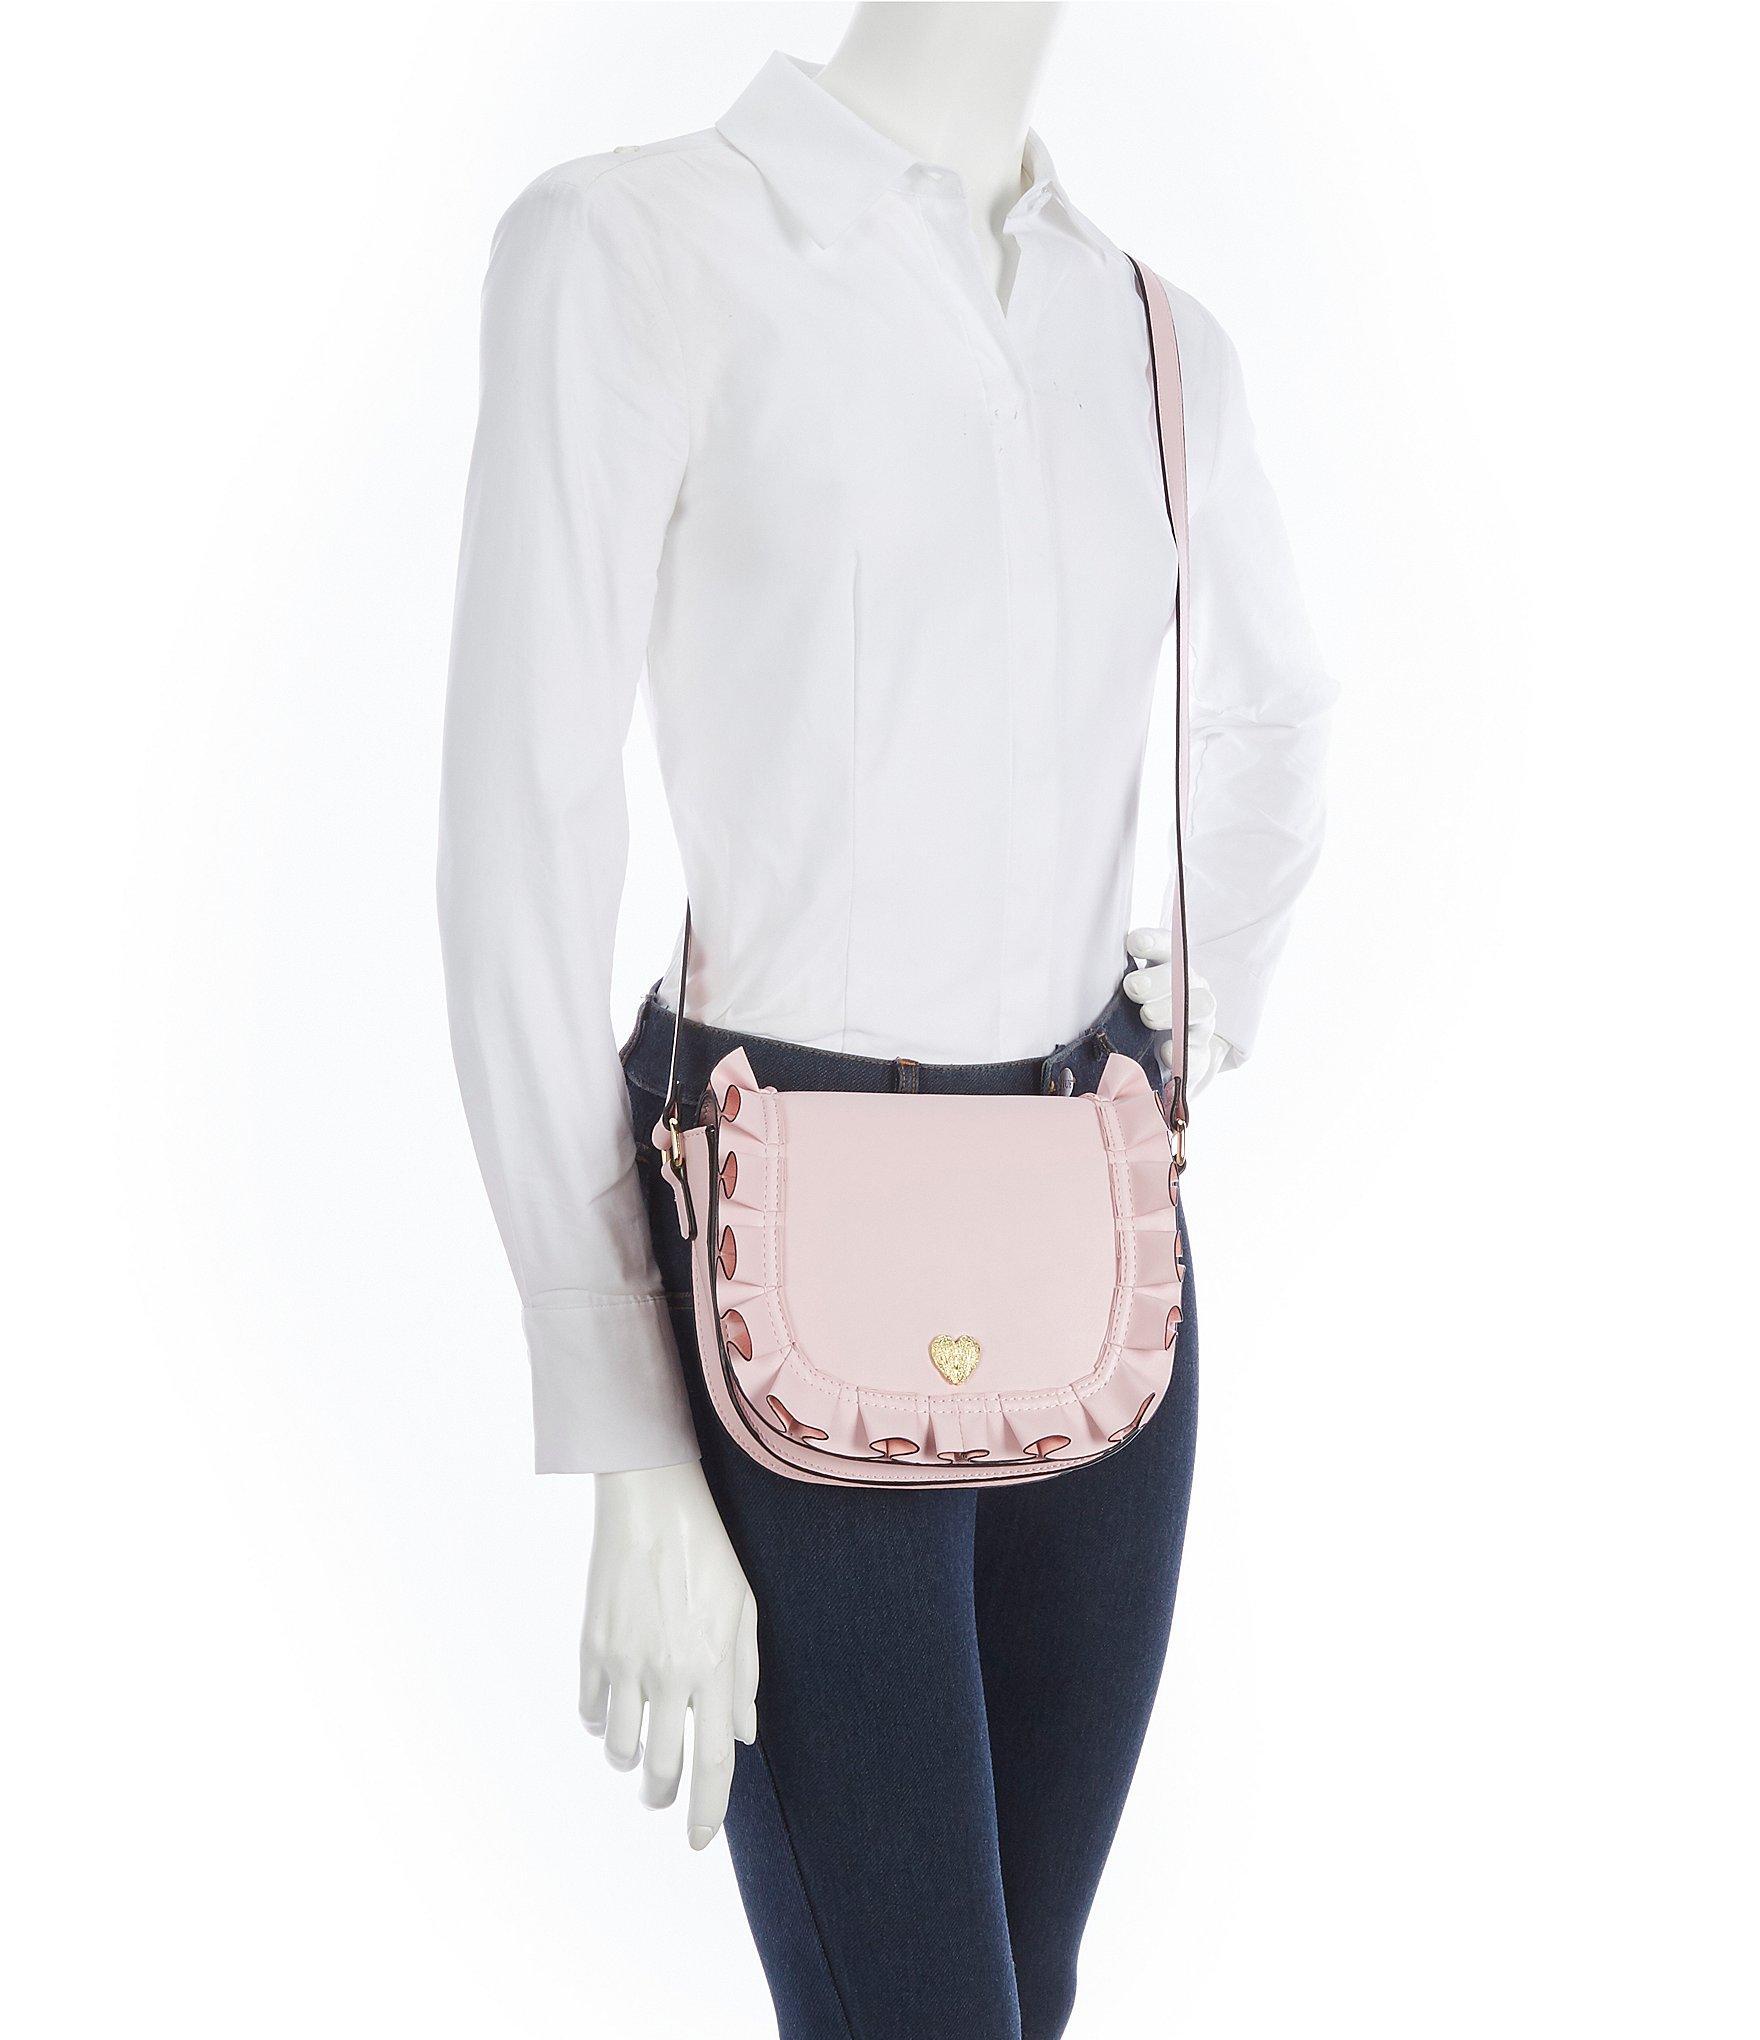 a706e15be35e Betsey Johnson - Pink Ruffle Me Up Saddle Cross-body Bag - Lyst. View  fullscreen